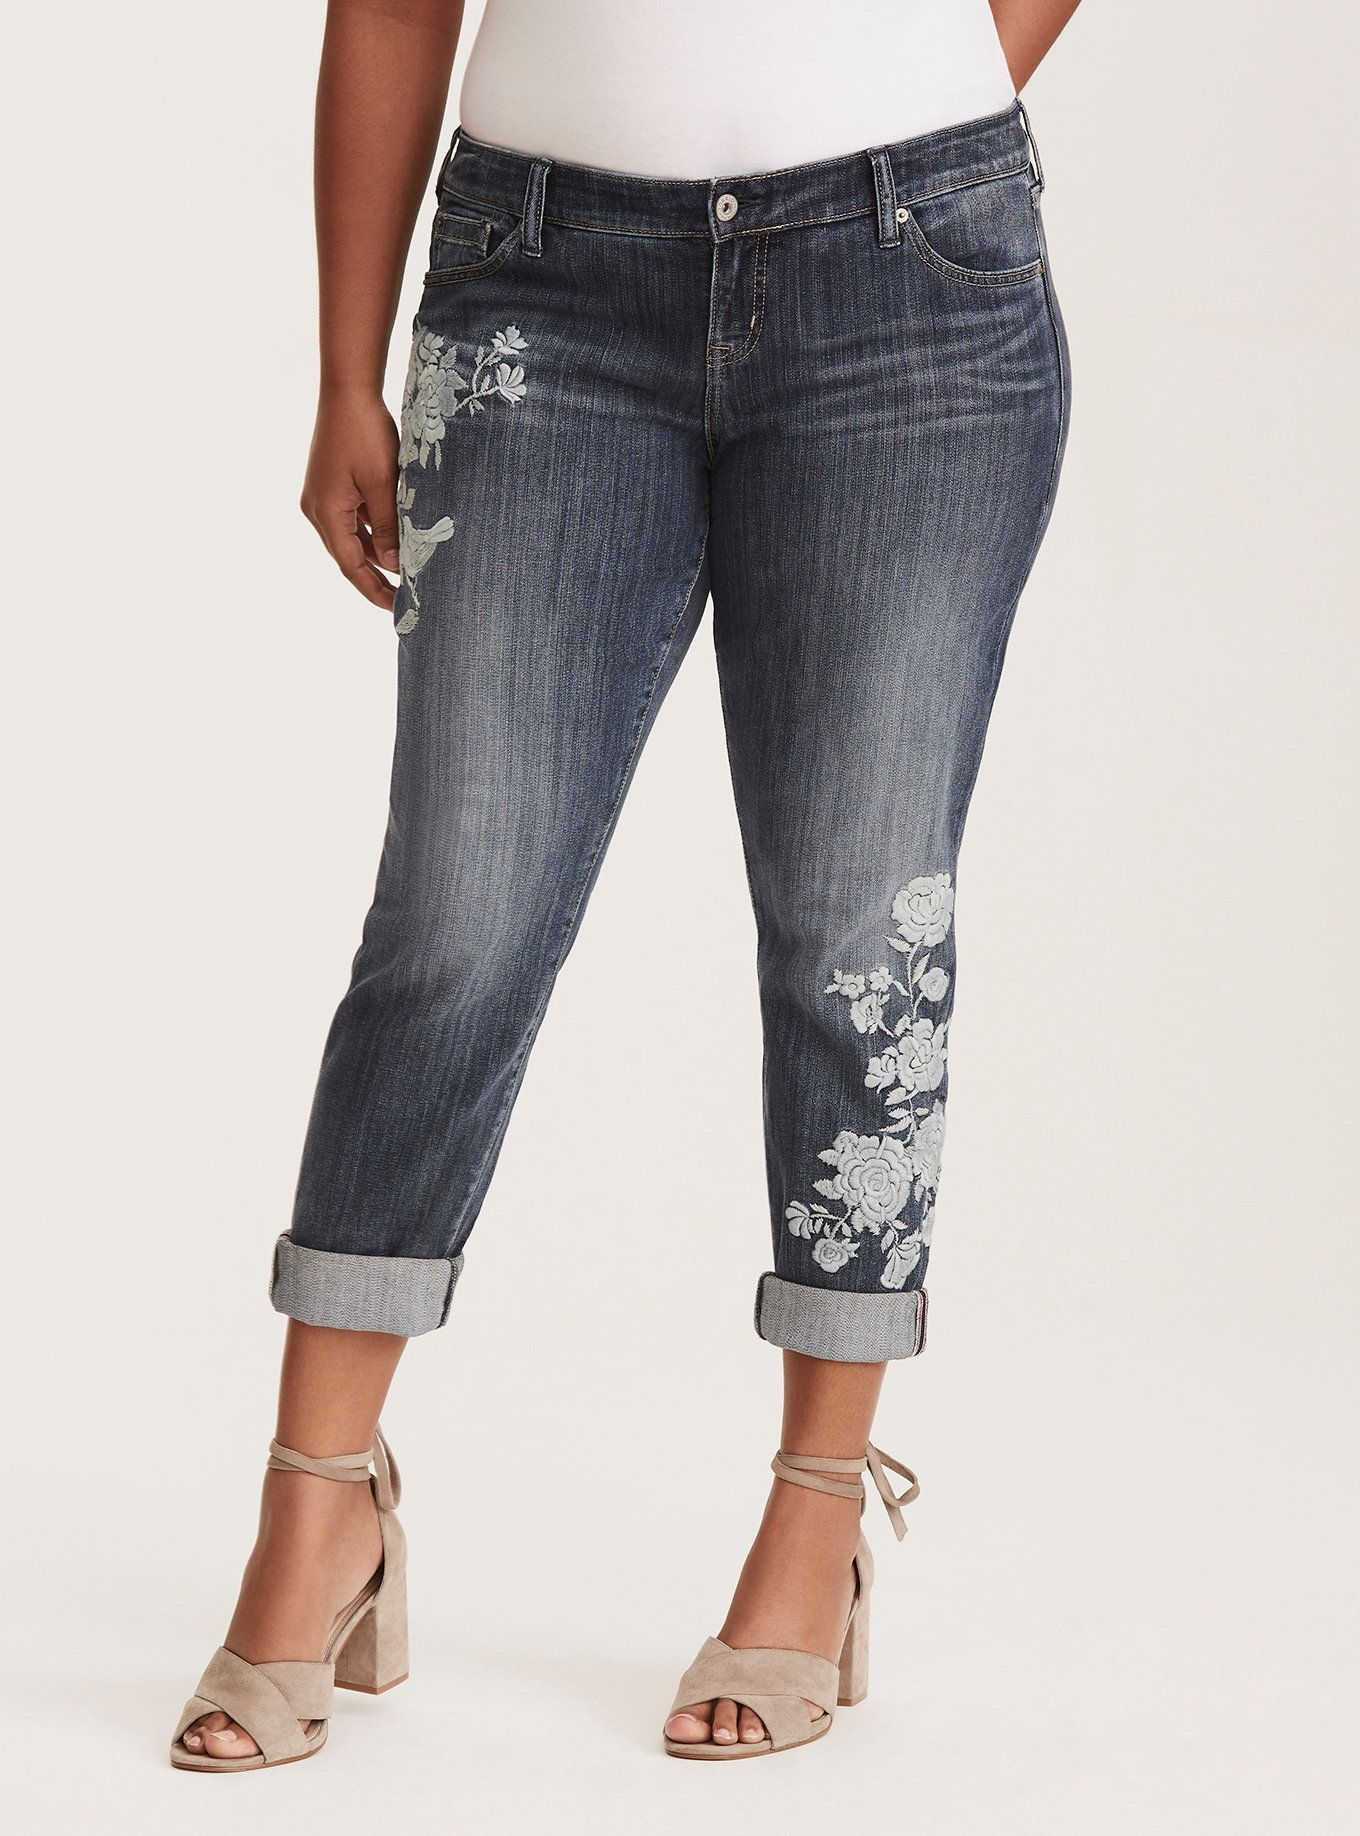 345688ef750 Torrid Vintage Premium Boyfriend Jeans - Medium Wash with Floral Embroidery